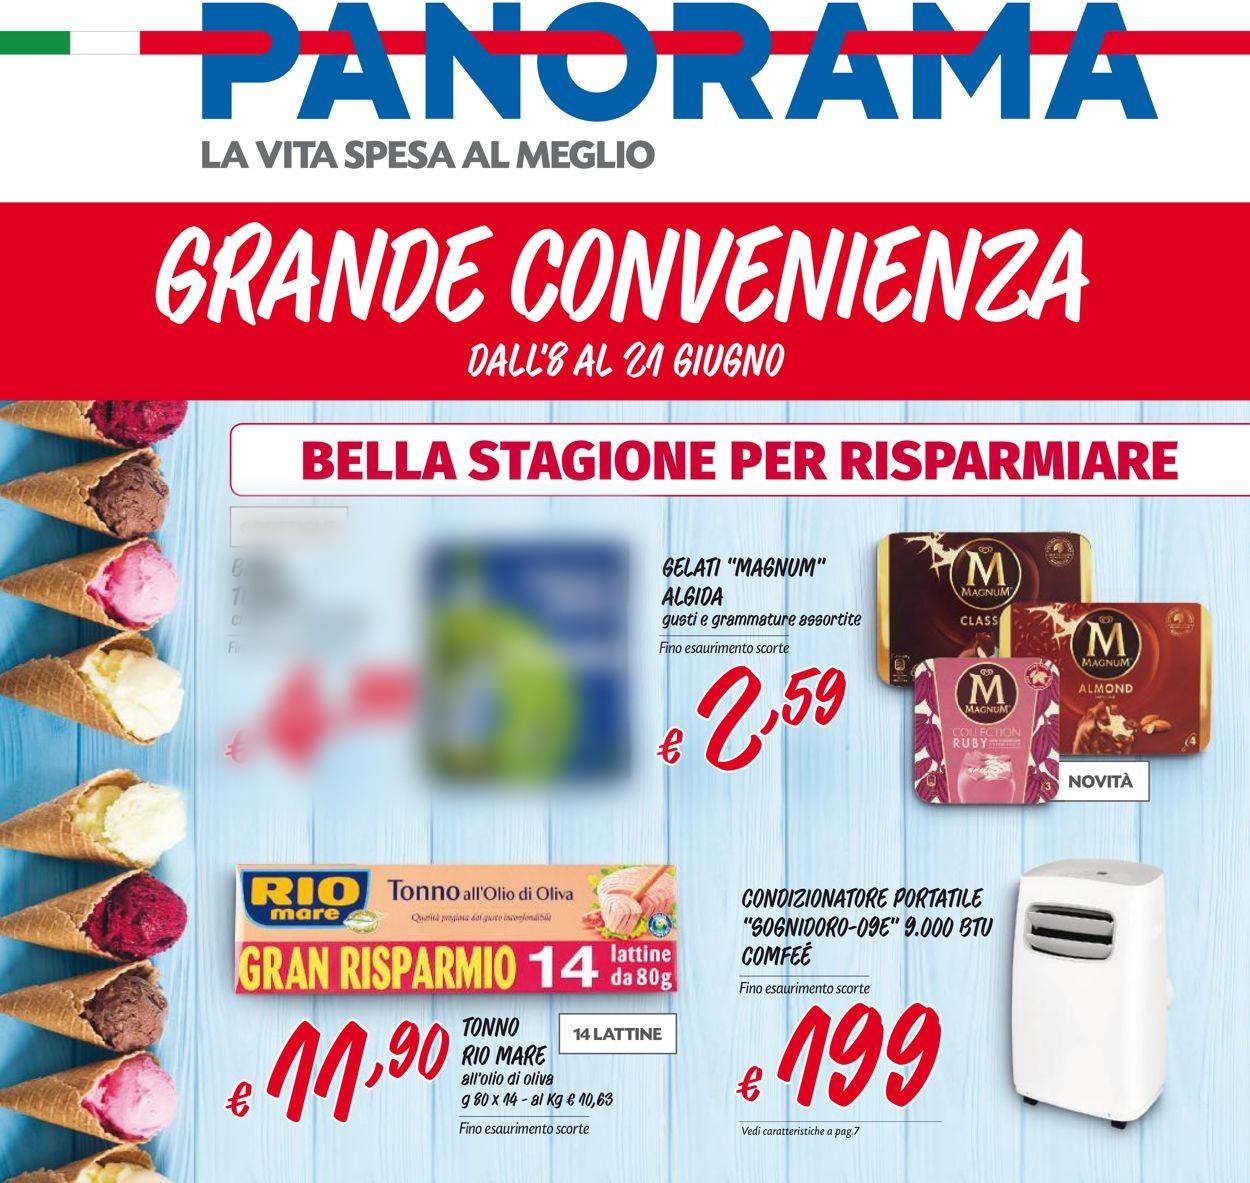 Volantino Pam Panorama - Offerte 08/06-21/06/2020